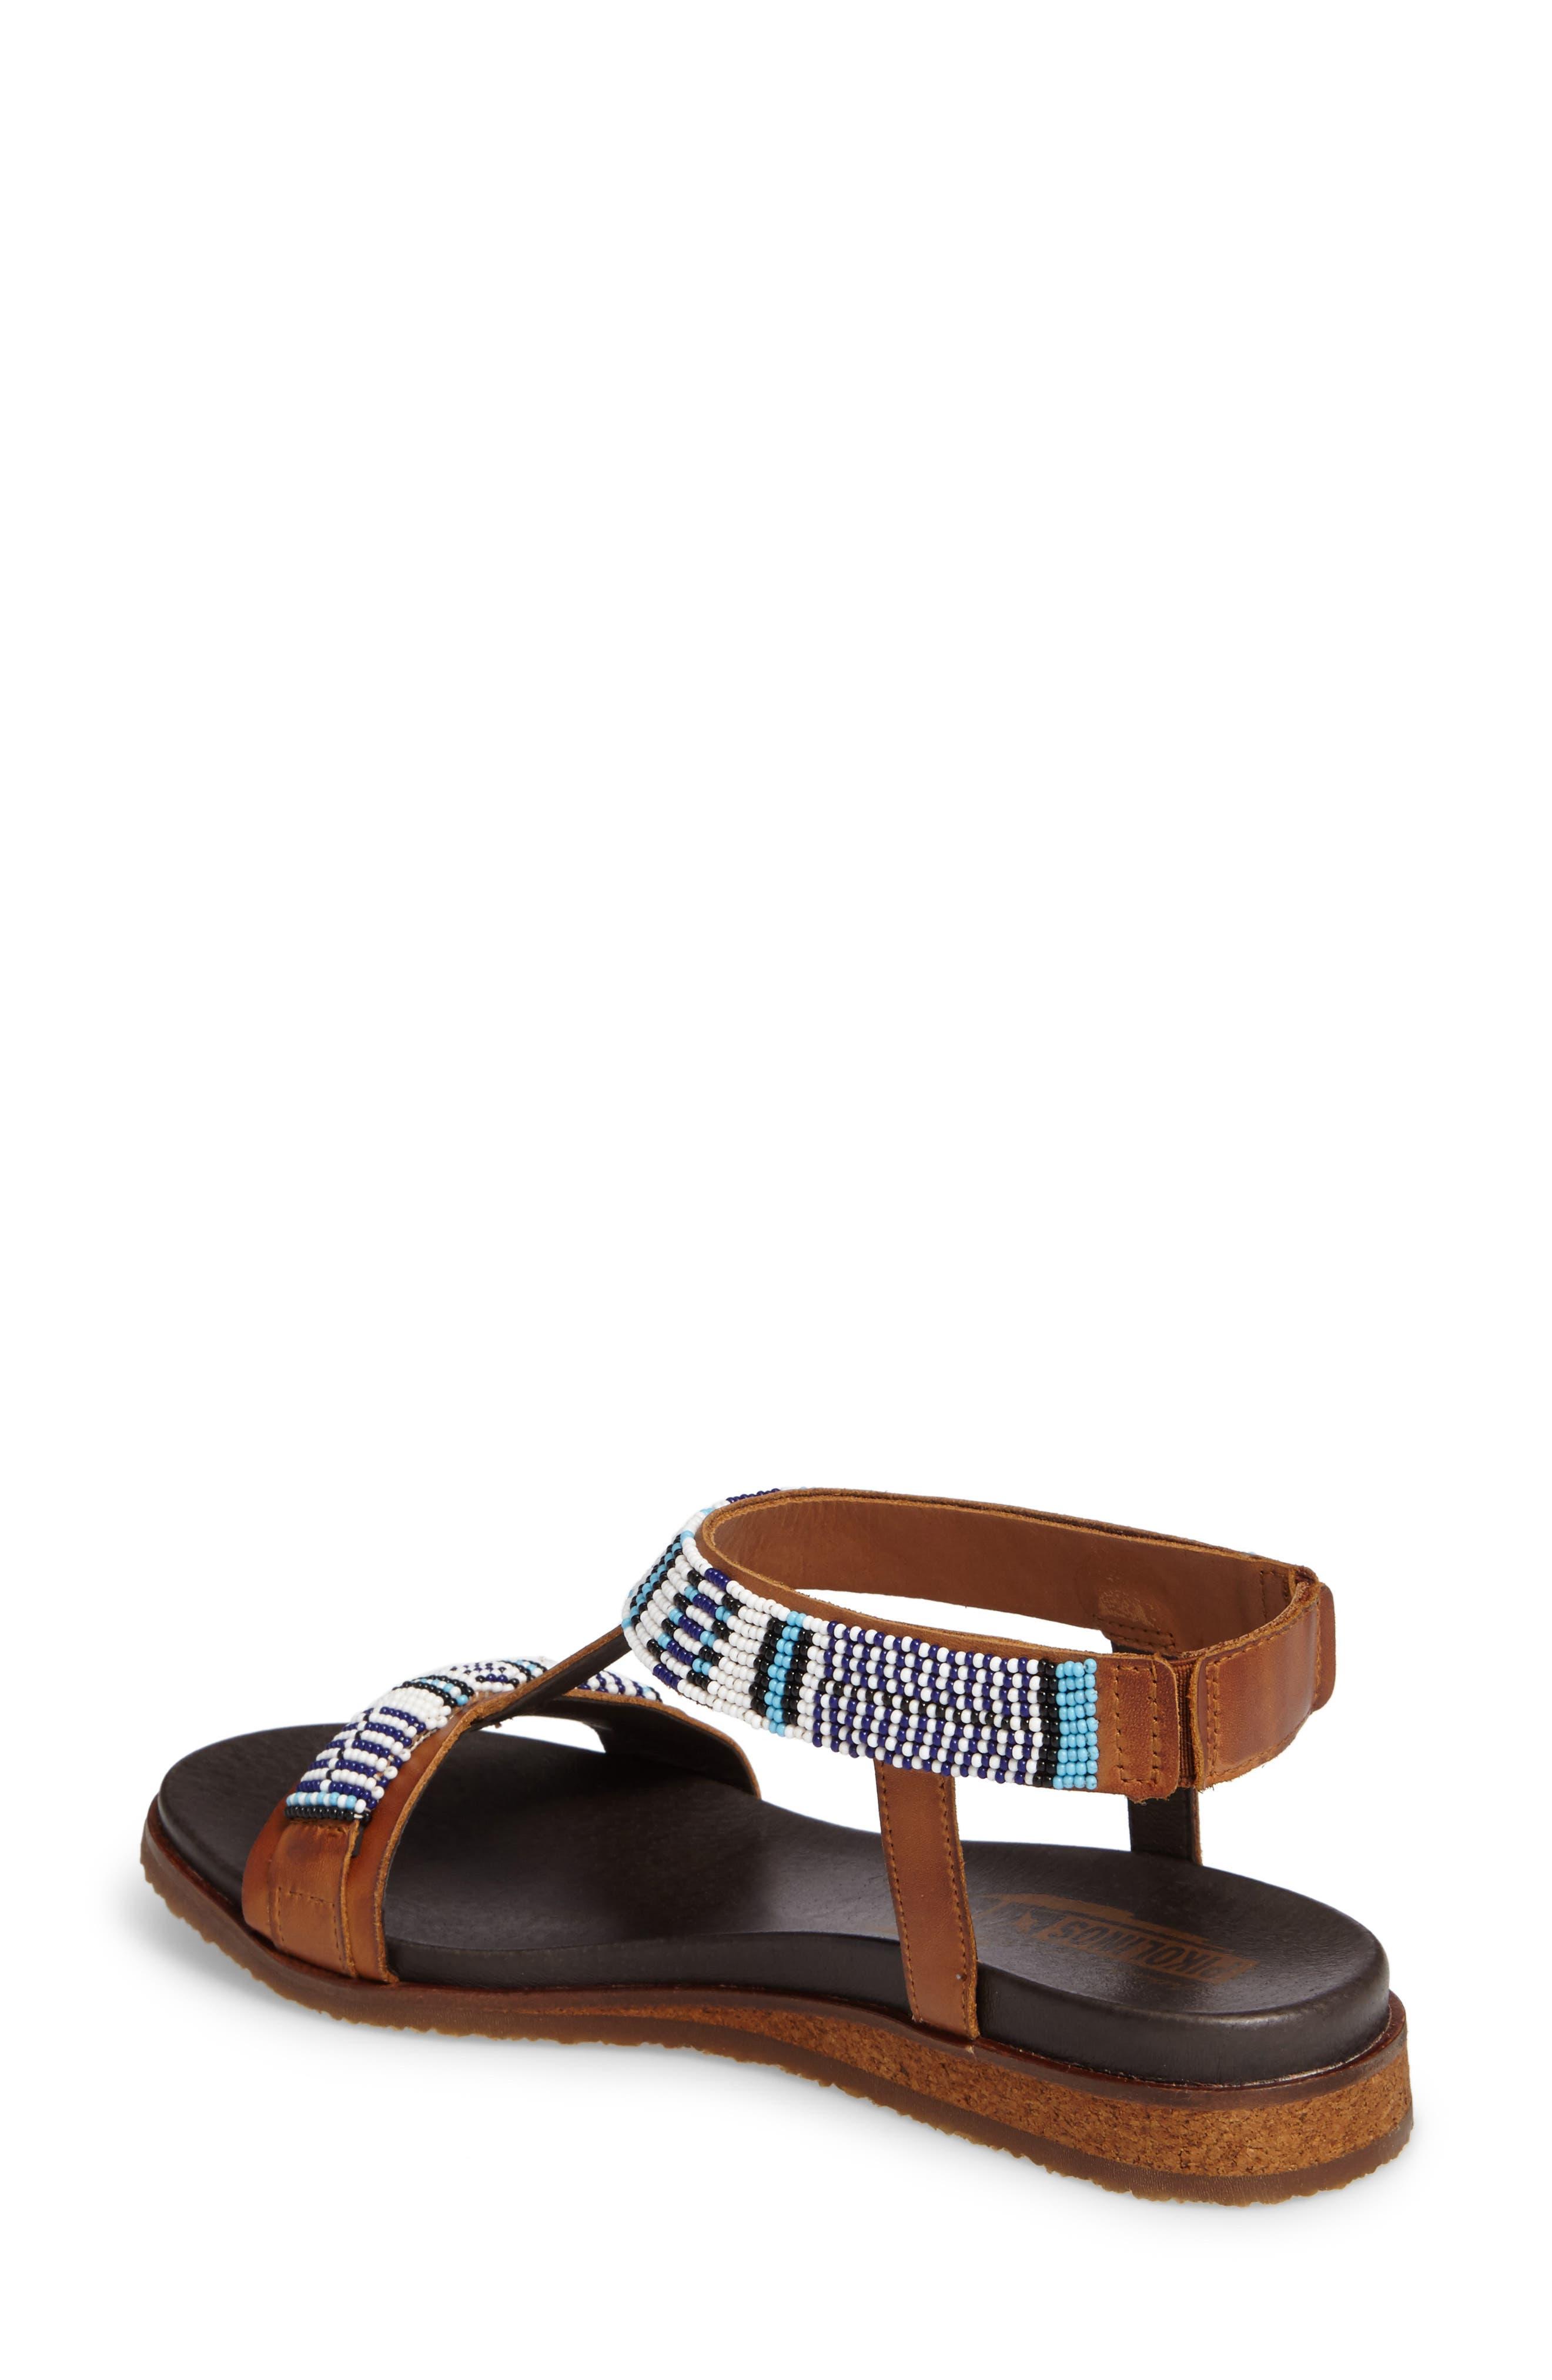 Antillas Beaded Sandal,                             Alternate thumbnail 2, color,                             Brandy Leather